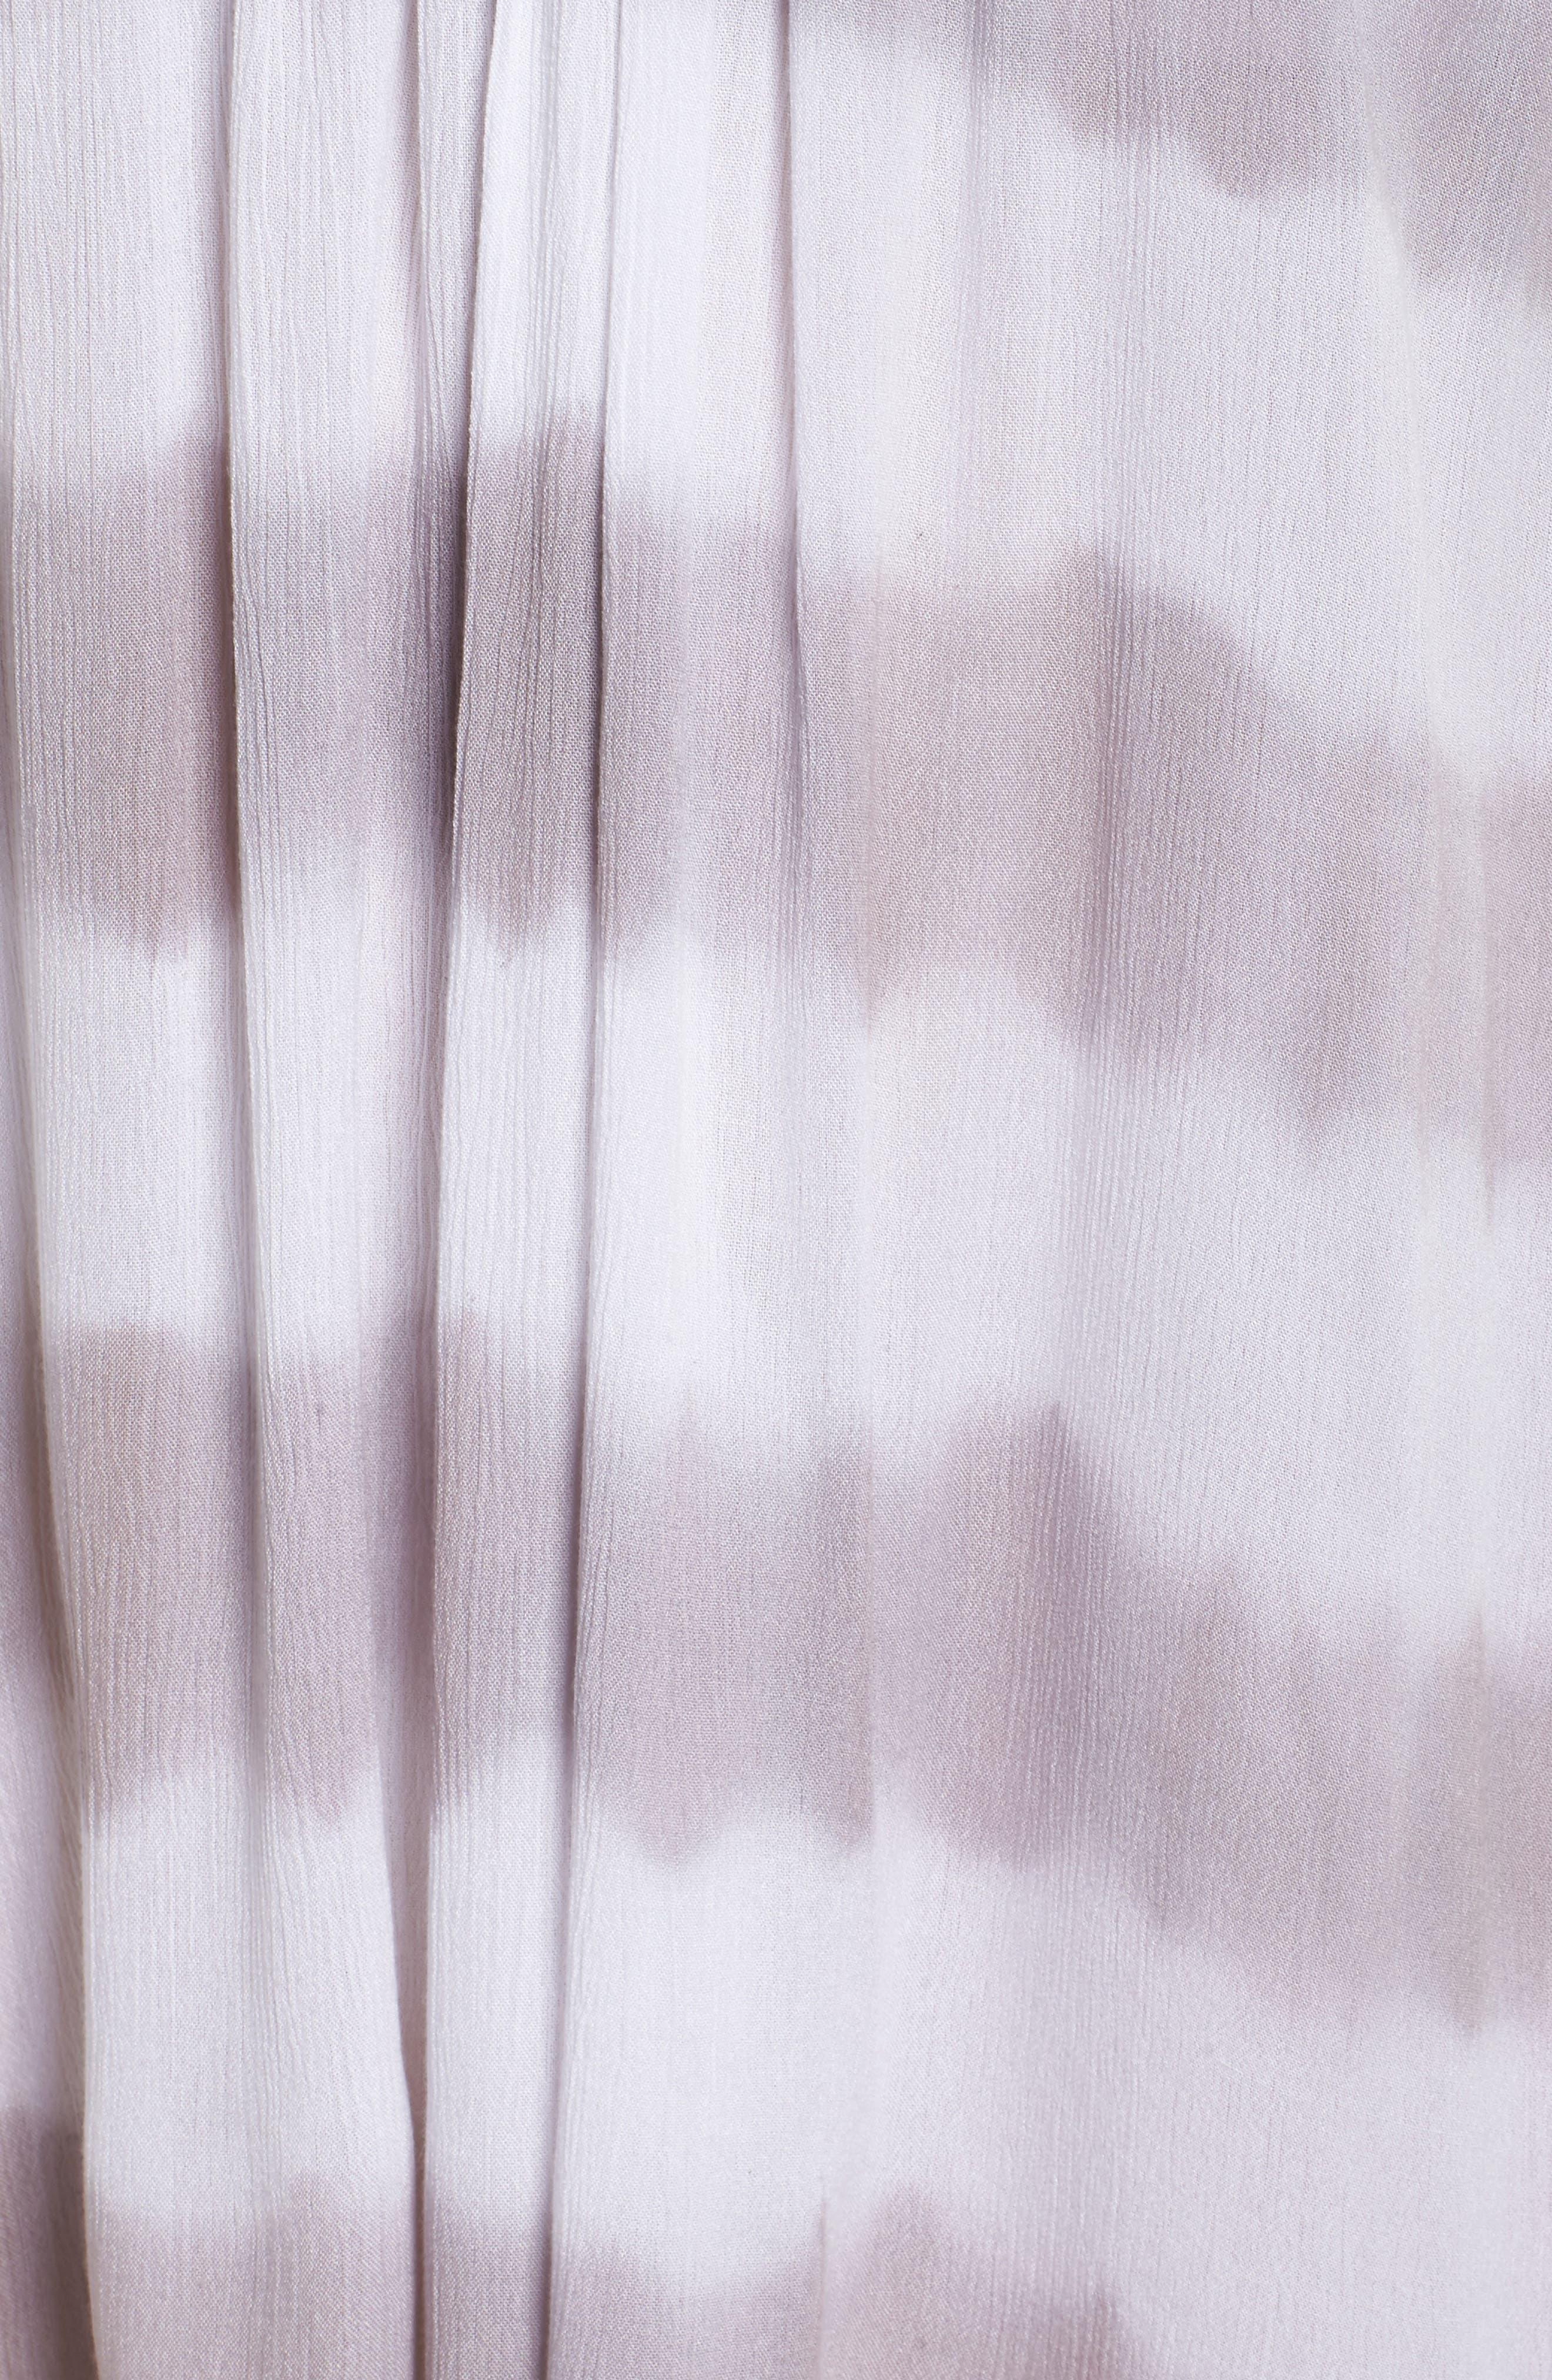 Cover-Up Dress,                             Alternate thumbnail 5, color,                             Grey/White Stripe